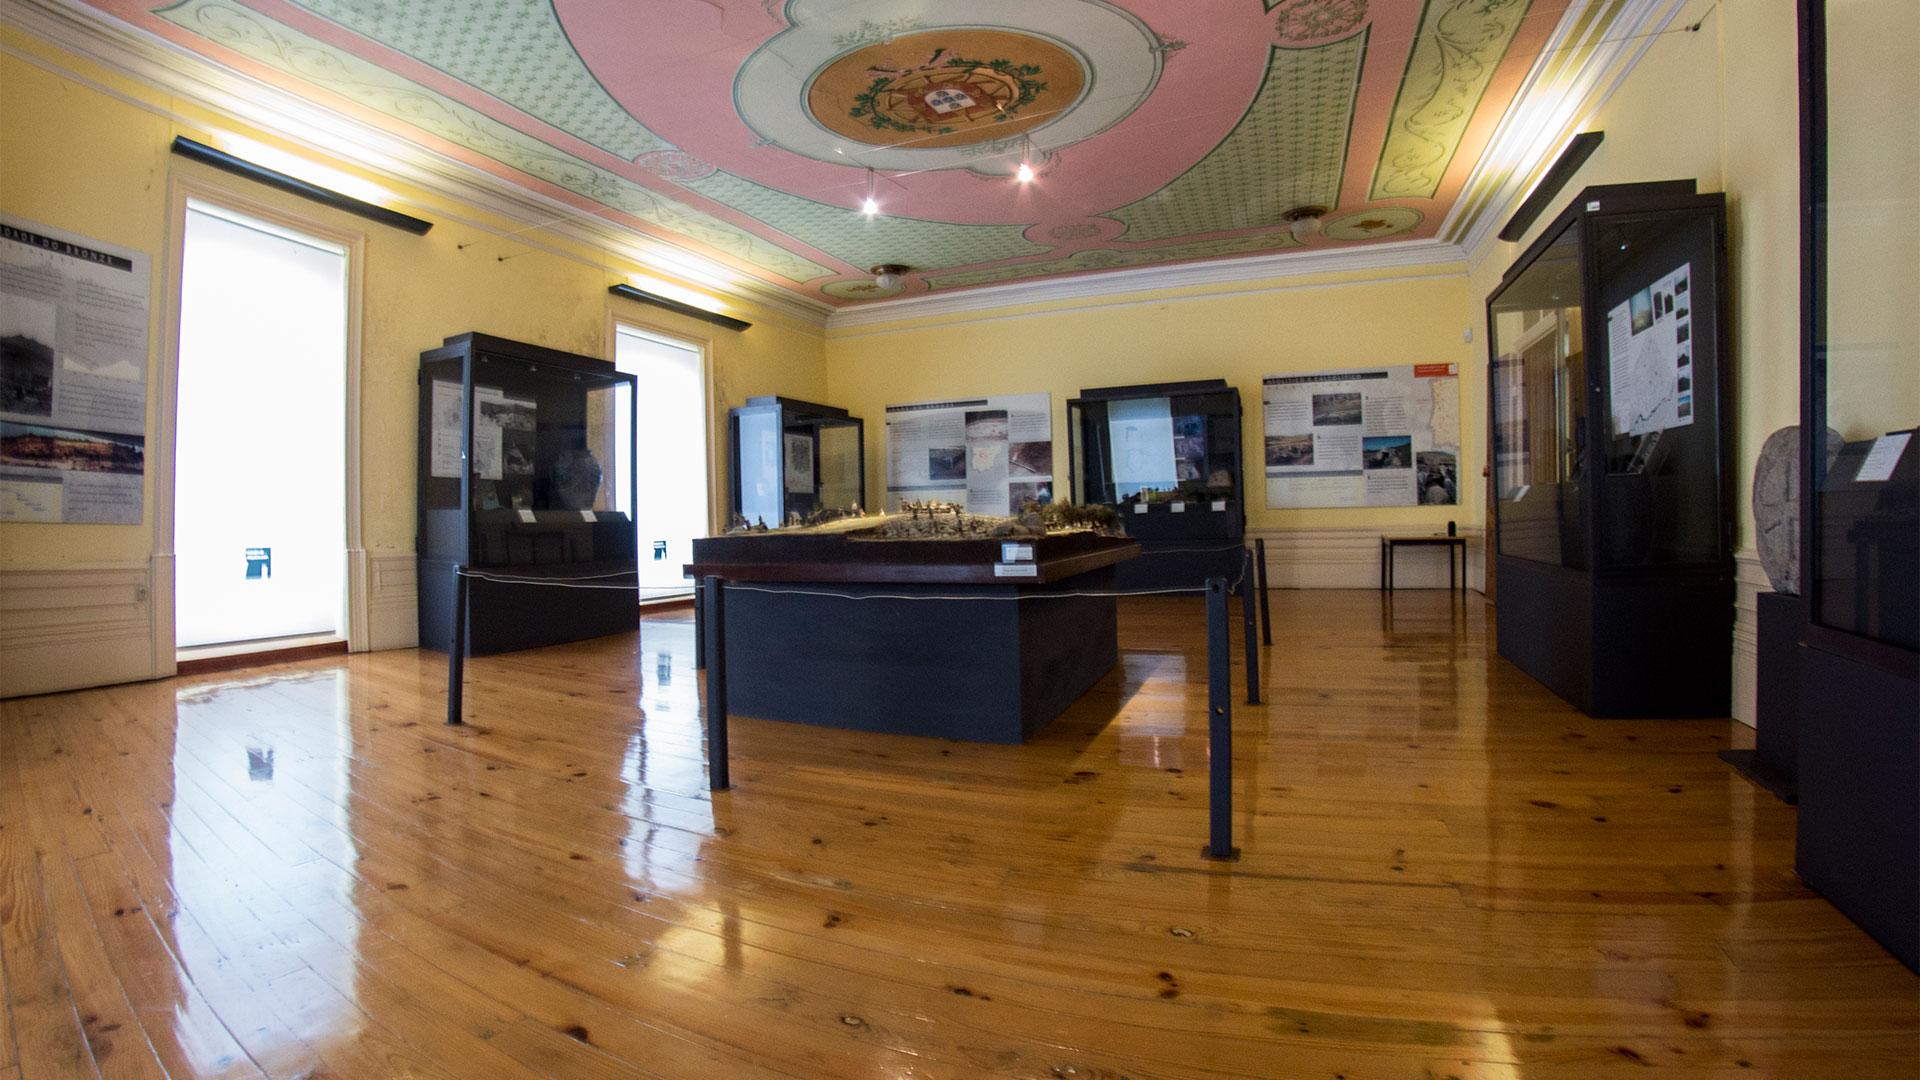 Núcleo de Arqueología del Museo Municipal de Baião